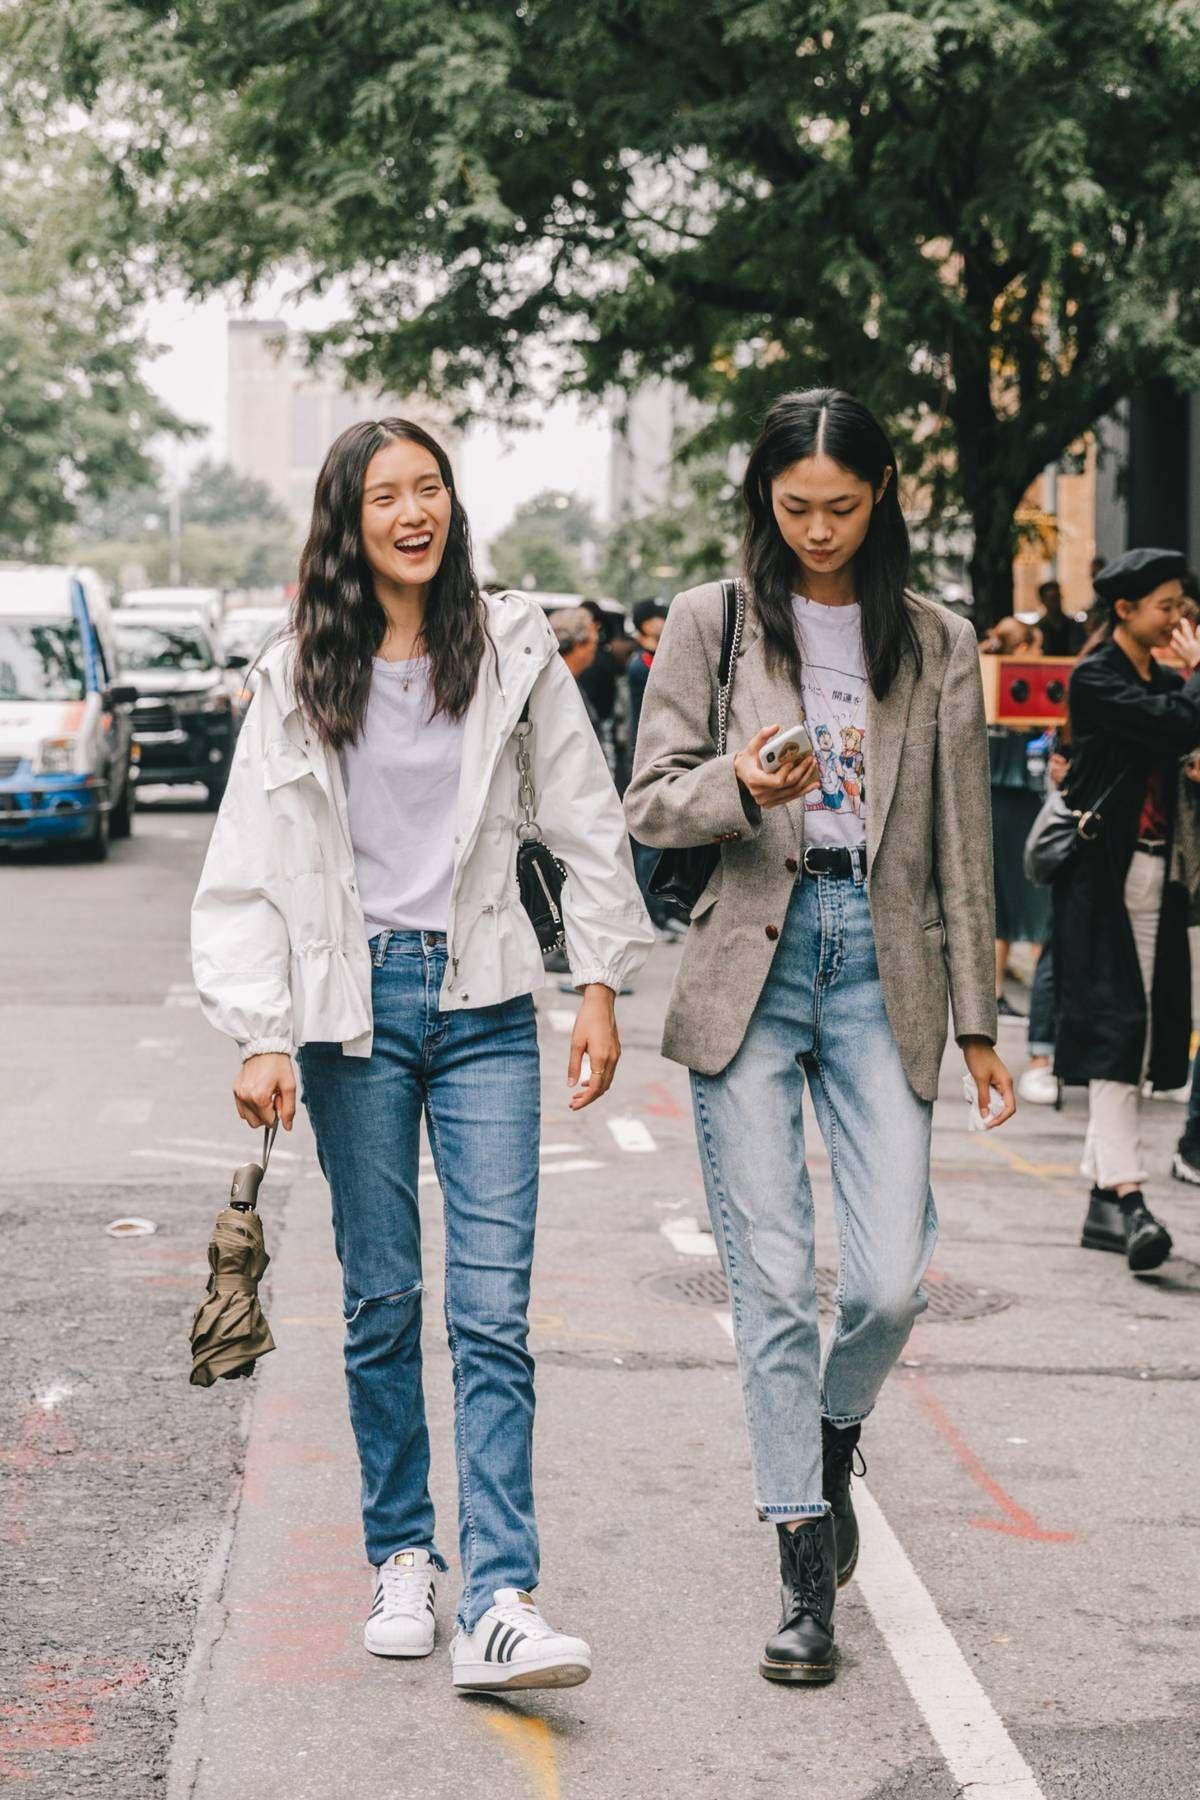 , Jeans Don't Fit Anymore? 6 Hacks to Stretch and Shrink Your Denim, Hot Models Blog 2020, Hot Models Blog 2020